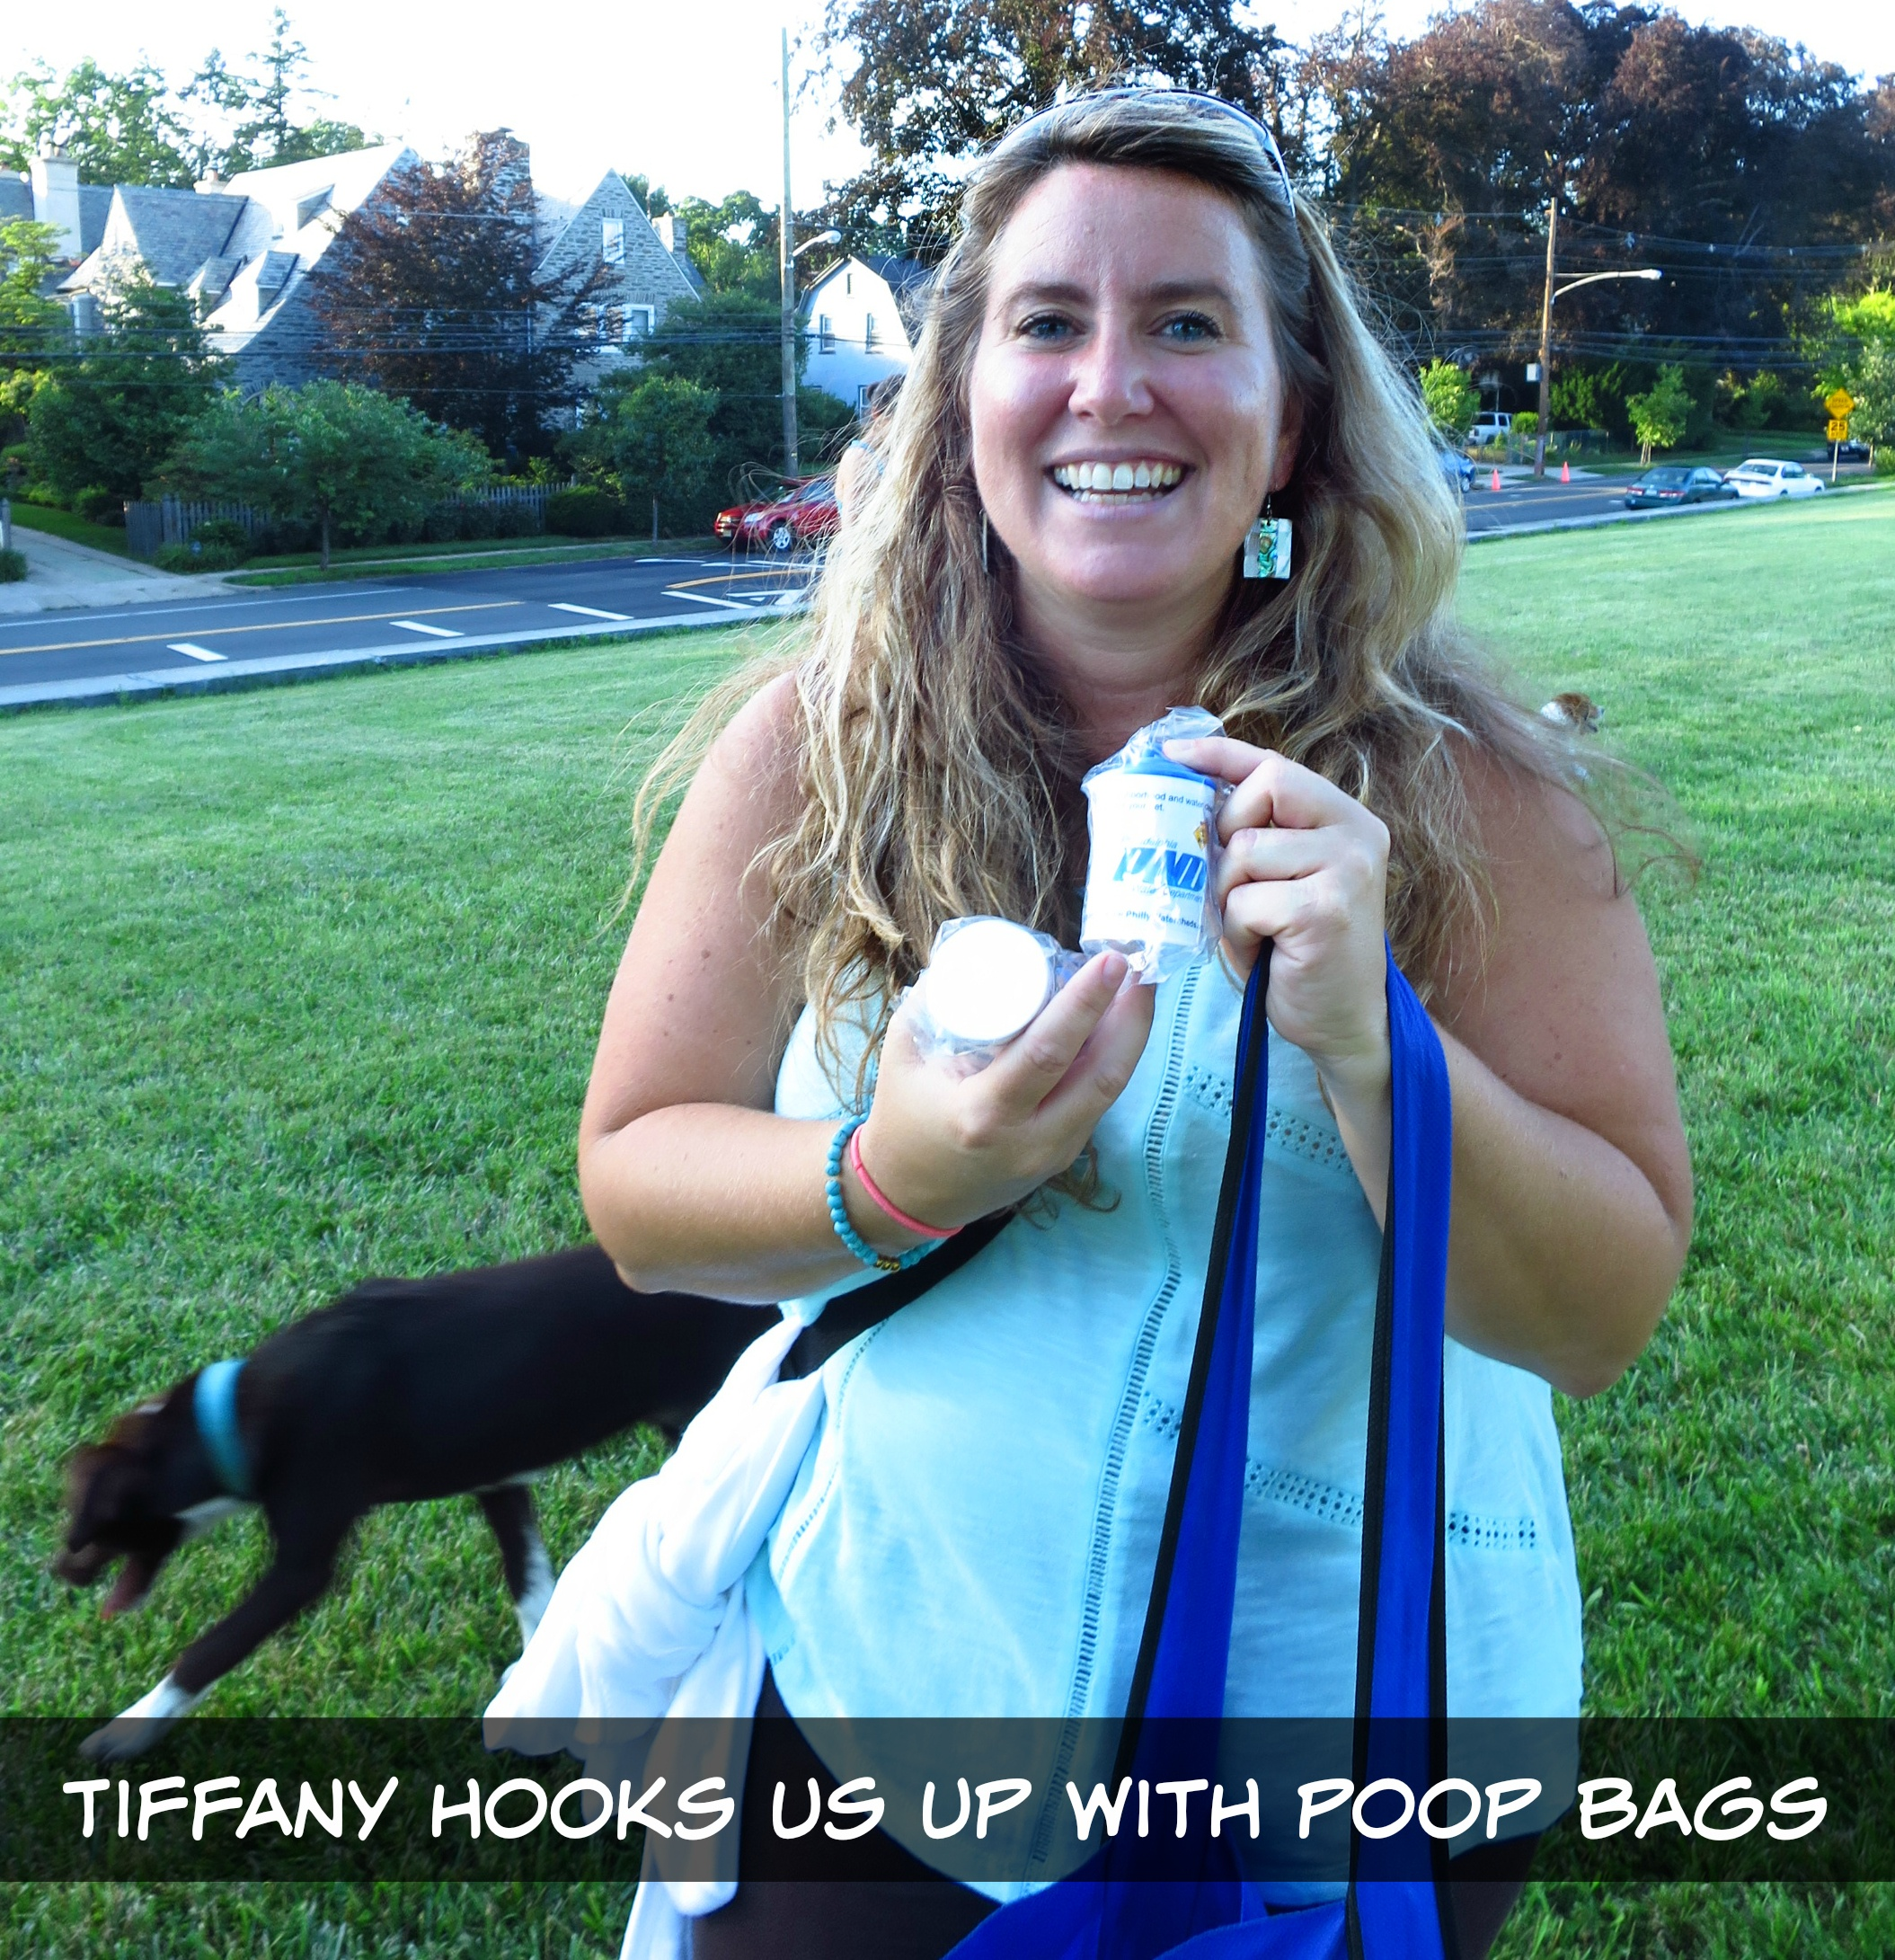 EastFallsLocal free poop bags dog